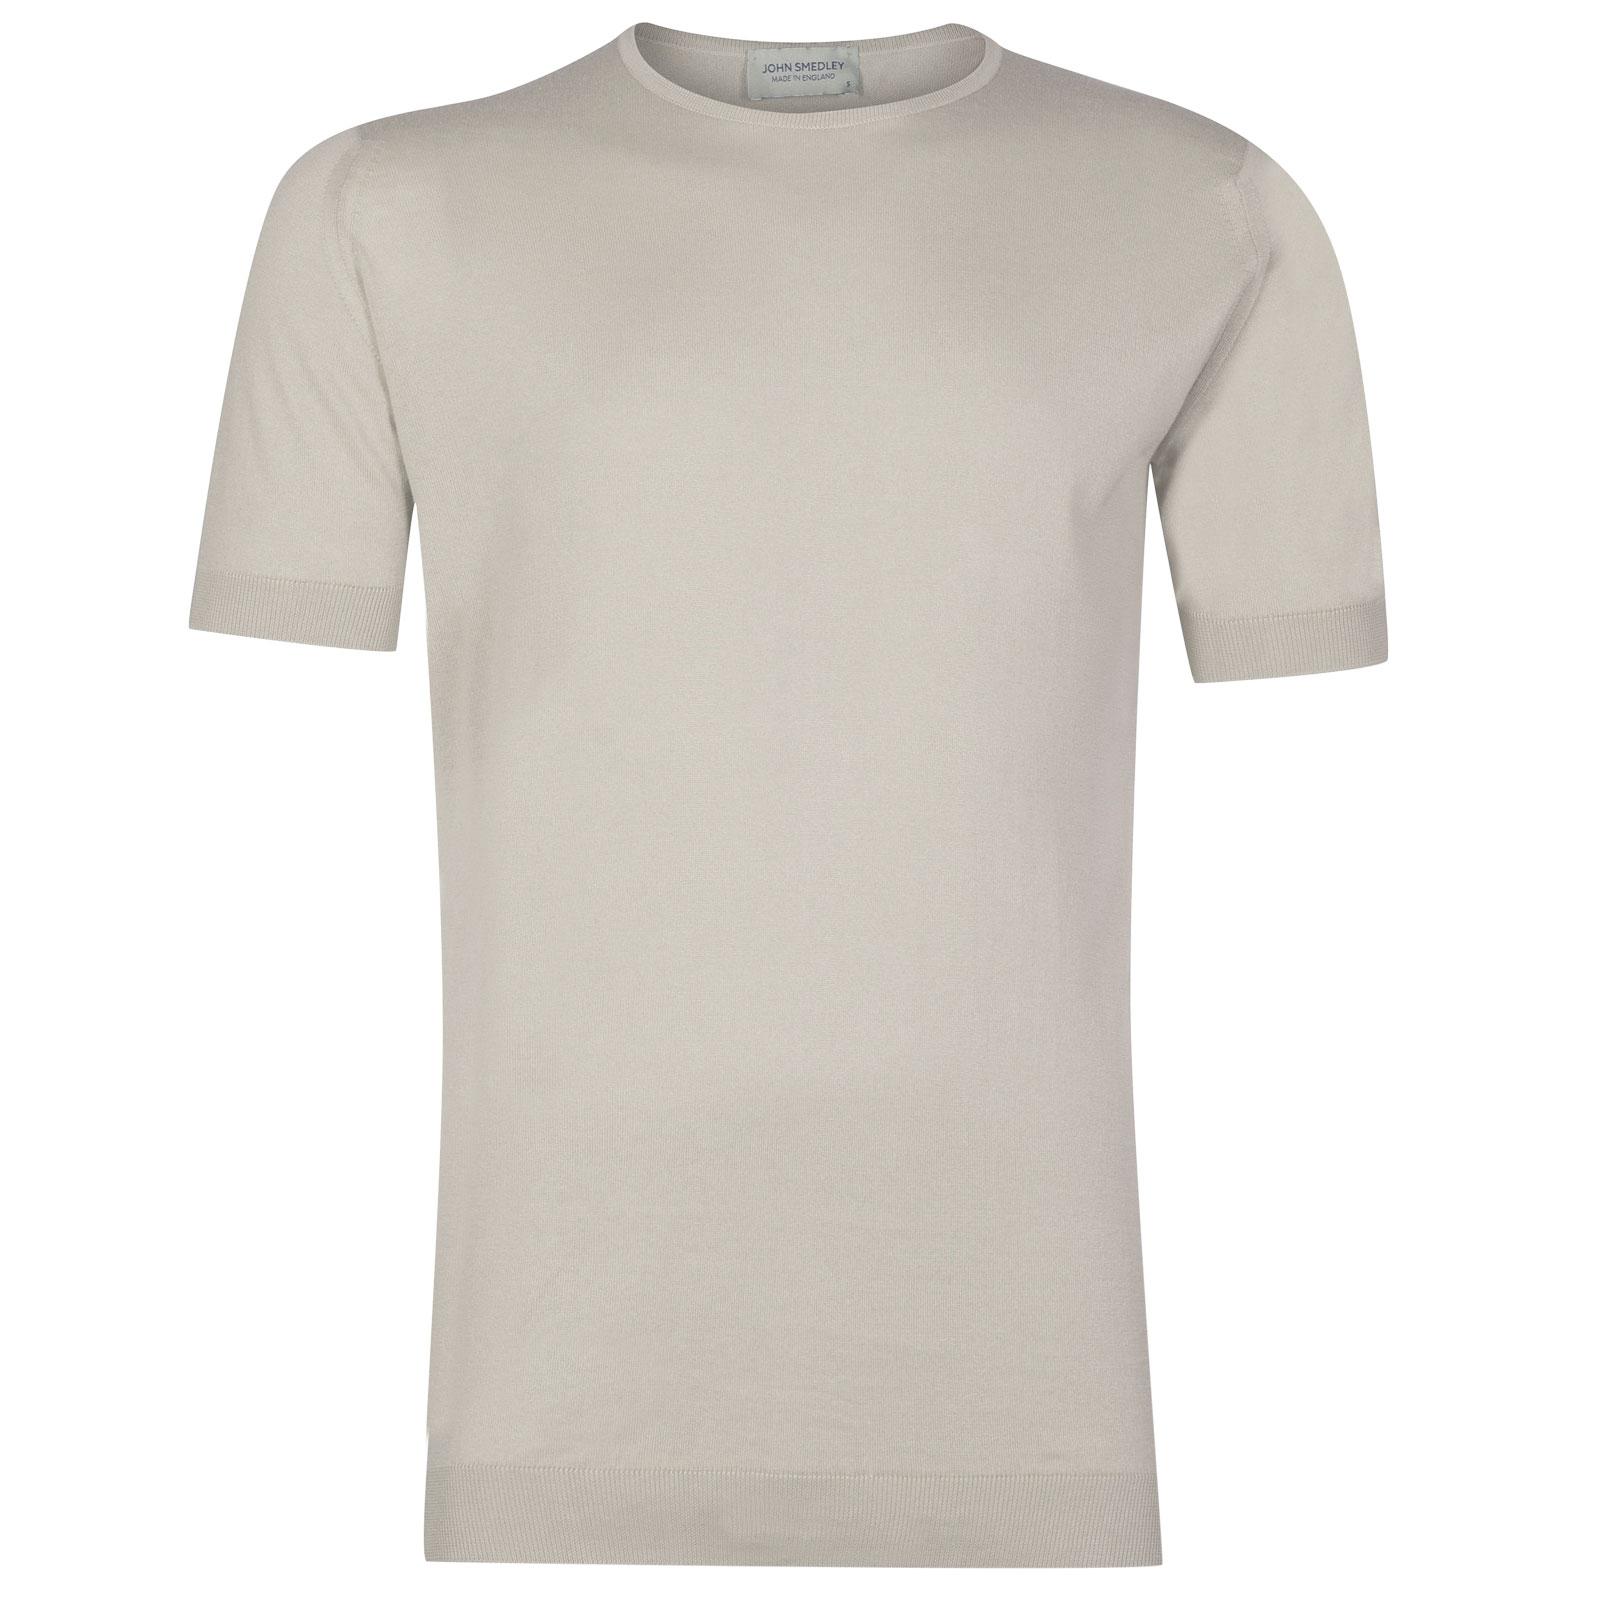 John Smedley Belden in Brunel Beige T-Shirt-MED